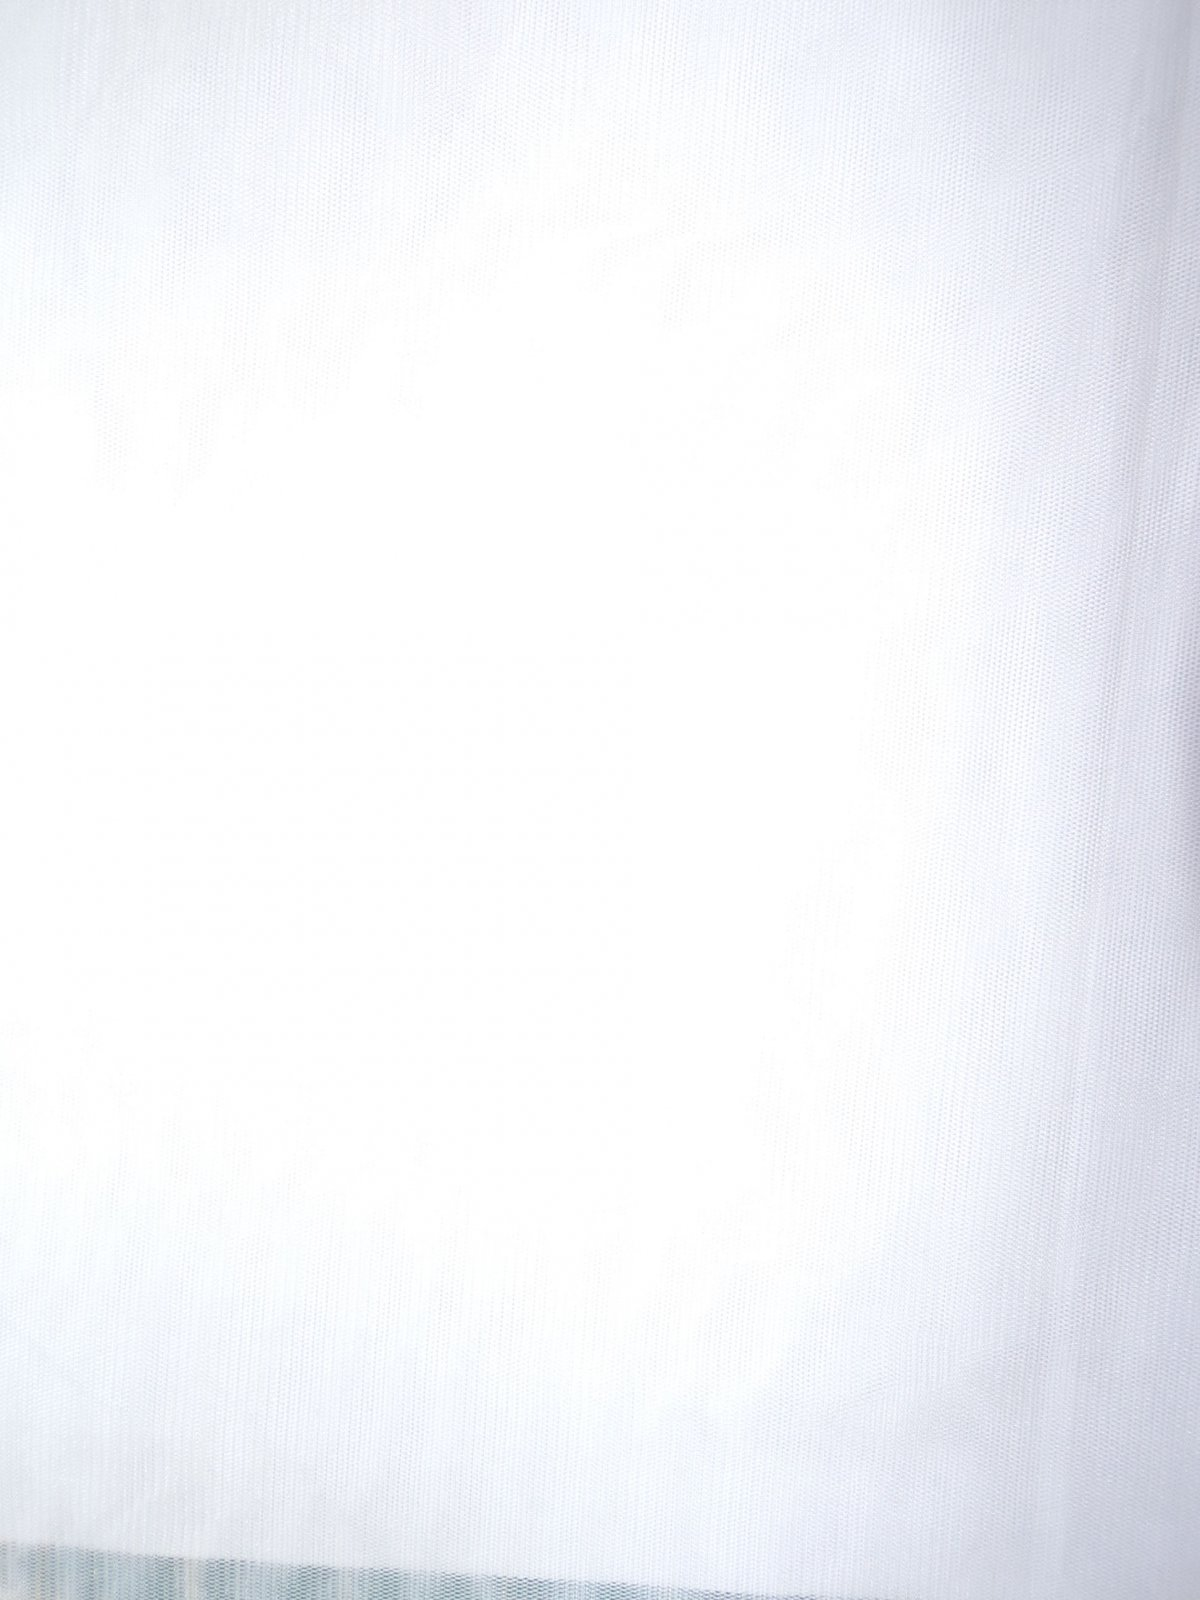 Stretch Mesh - White